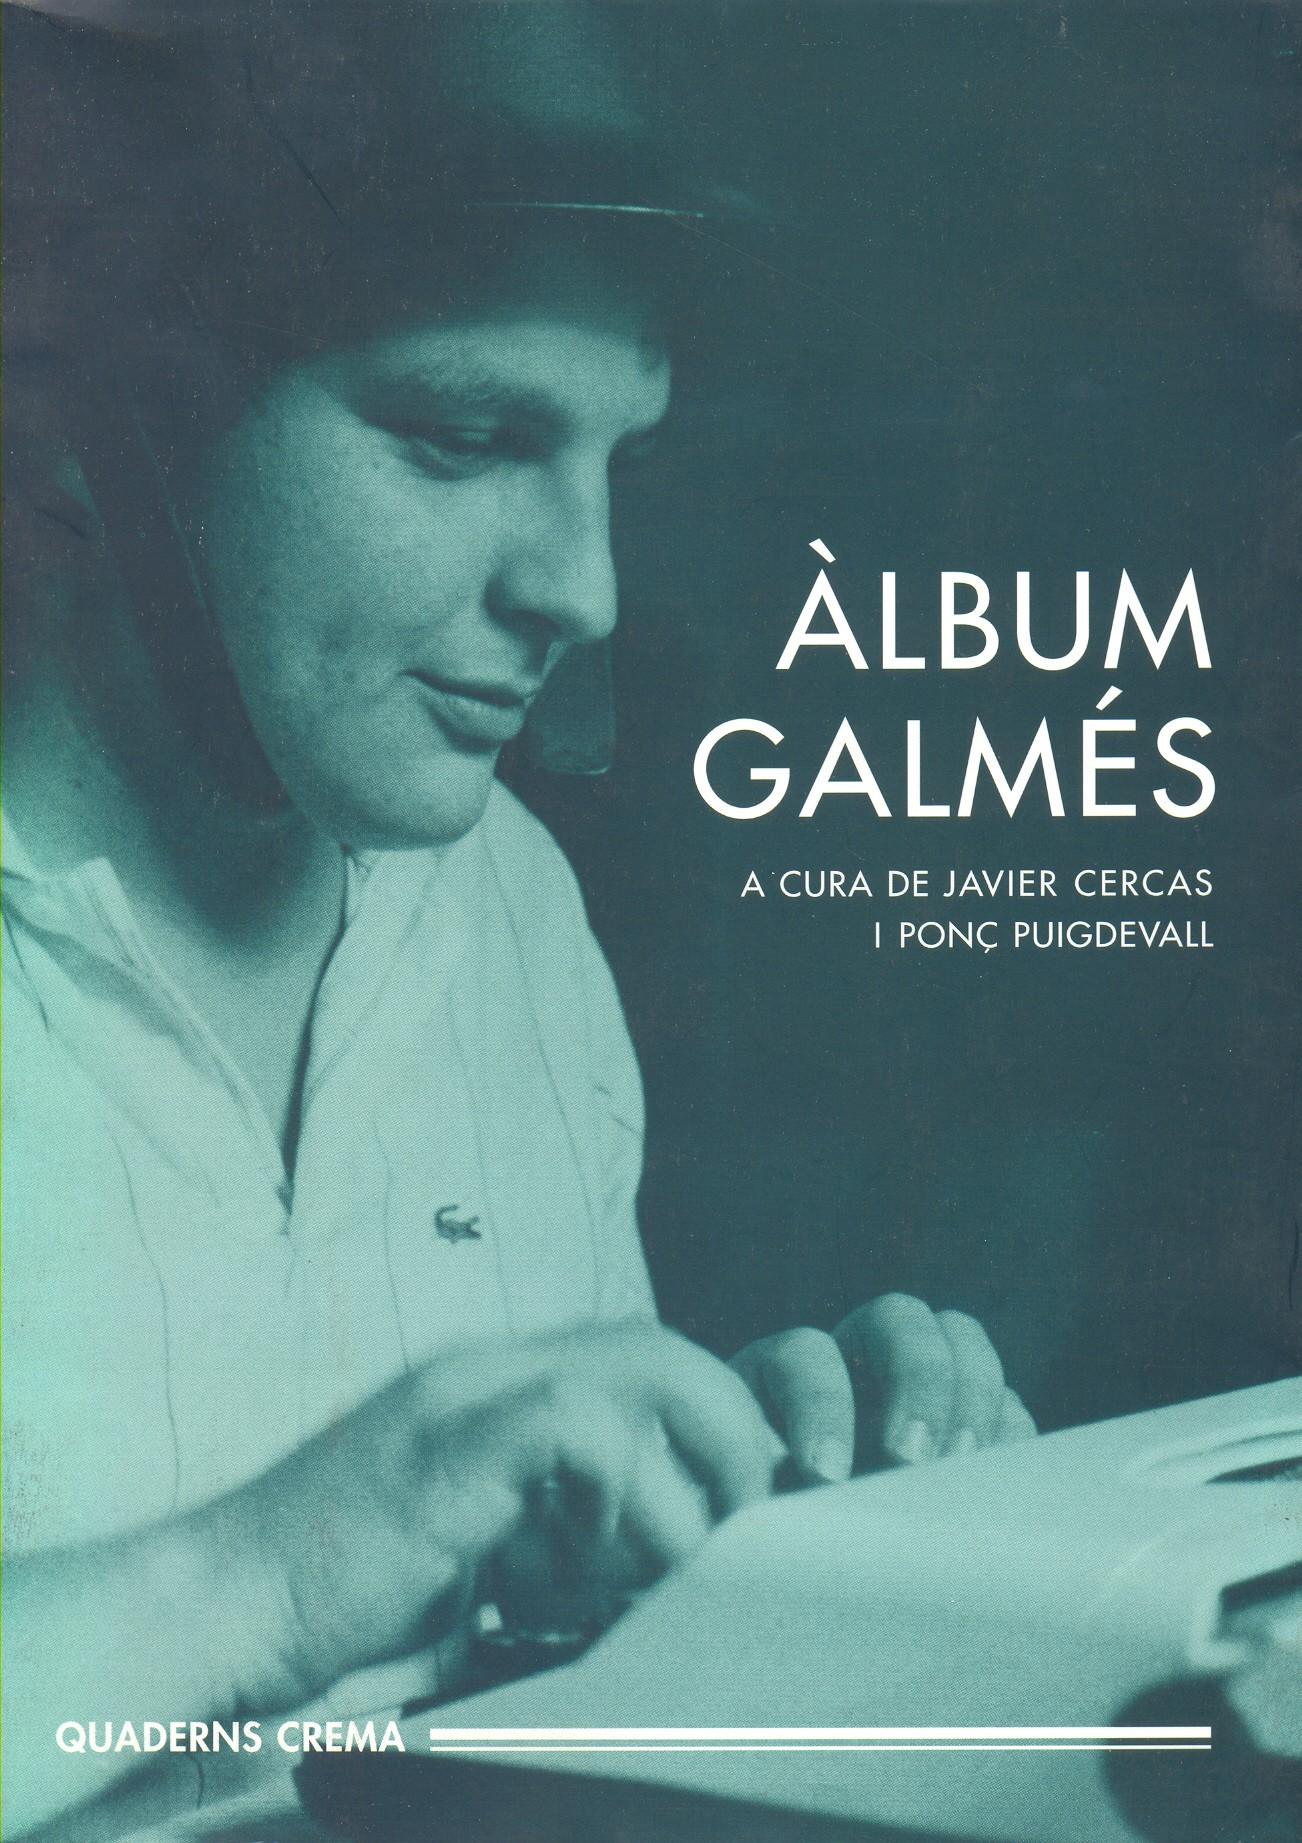 Àlbum Galmés